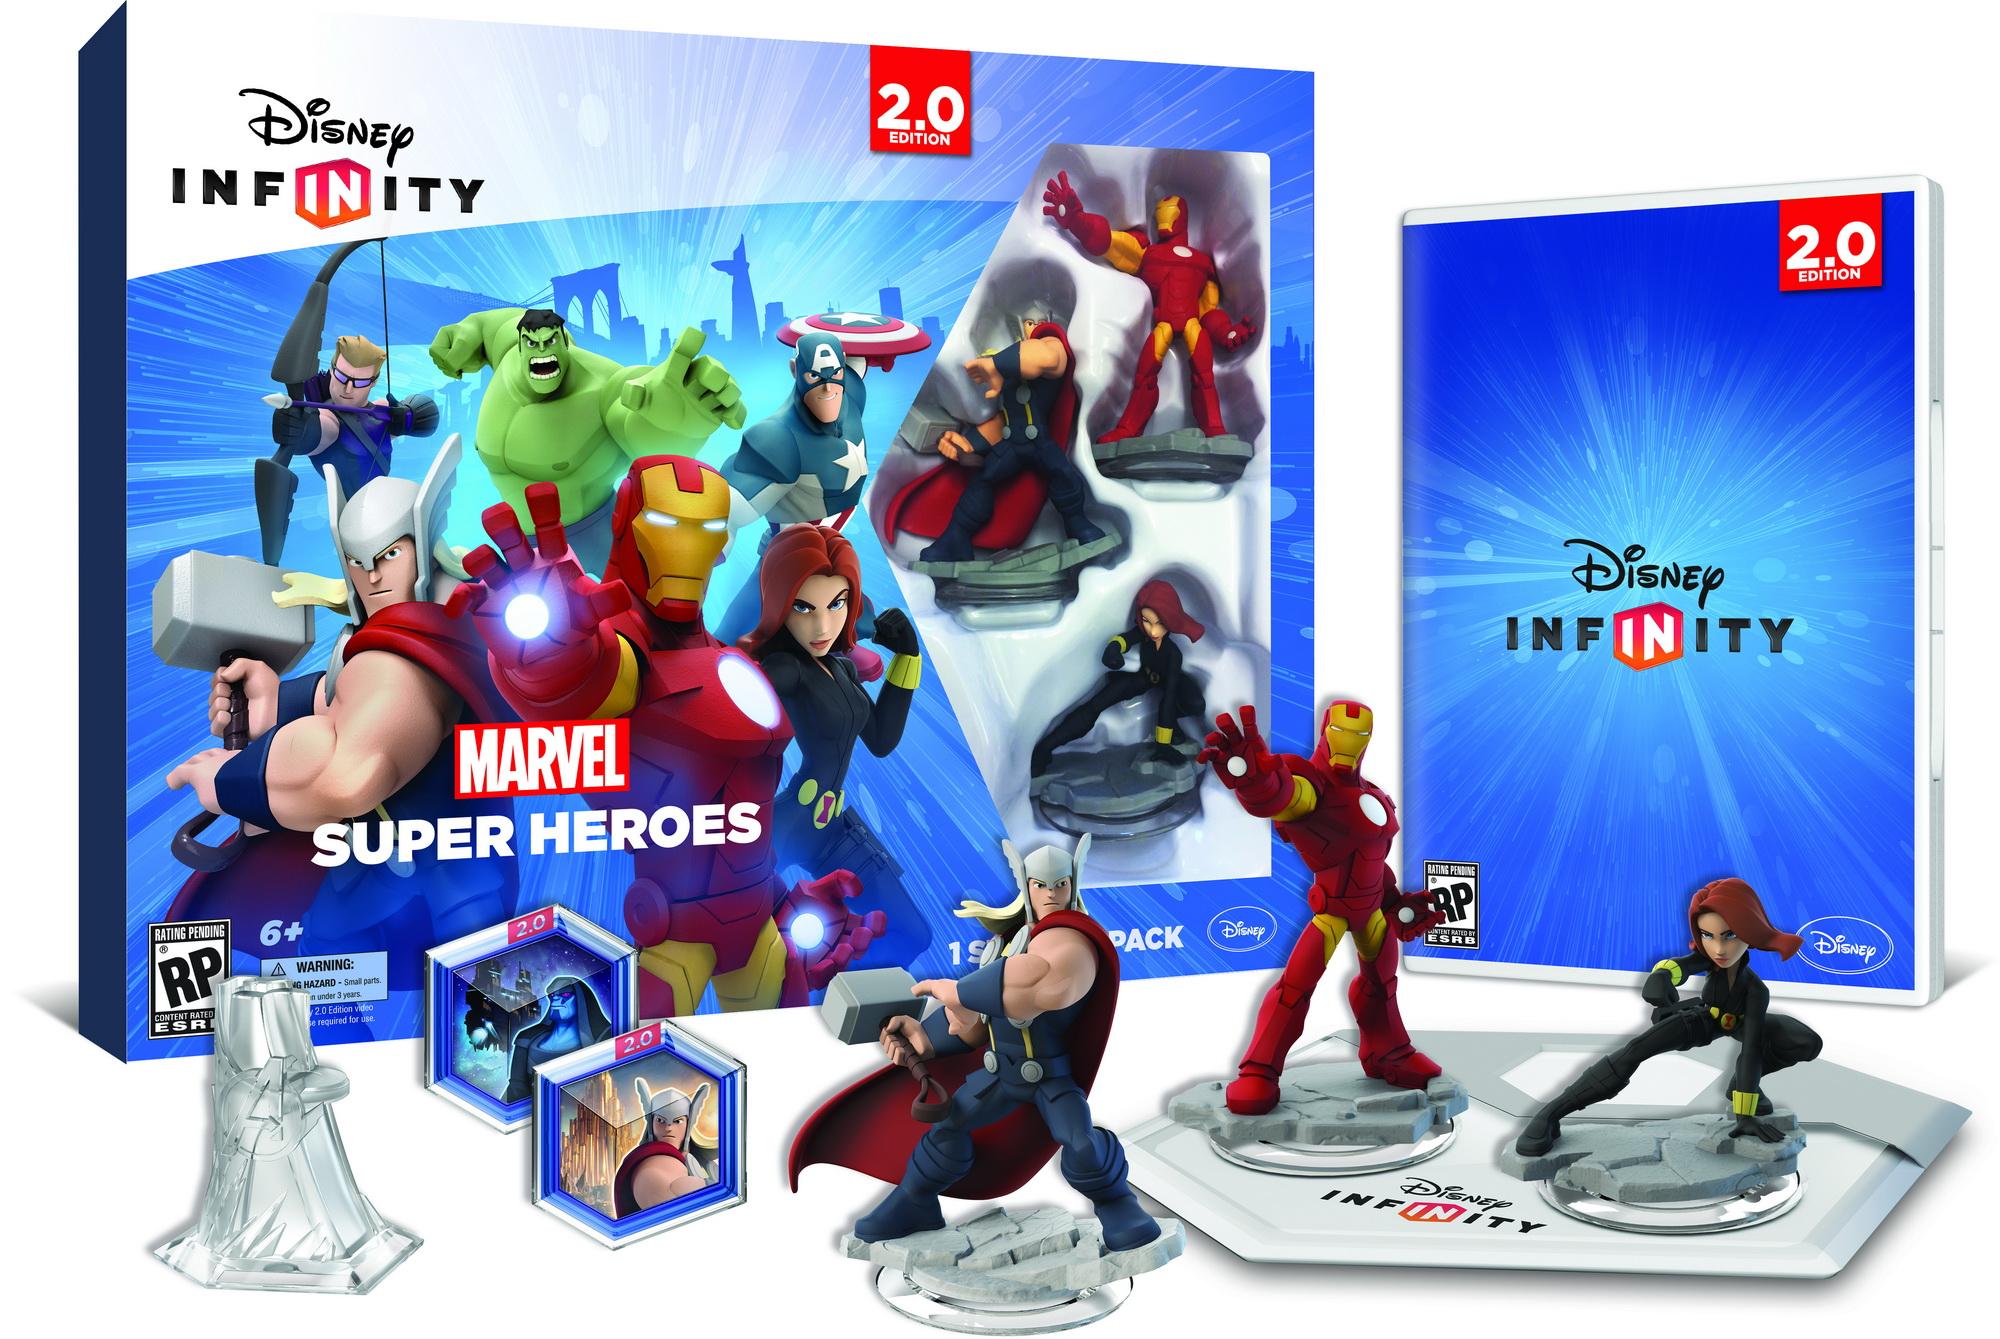 collection de jeux videos: 431 jeux/28 consoles/2 Pcb - Page 9 Disney_INFINITY_2.0_Starterpack